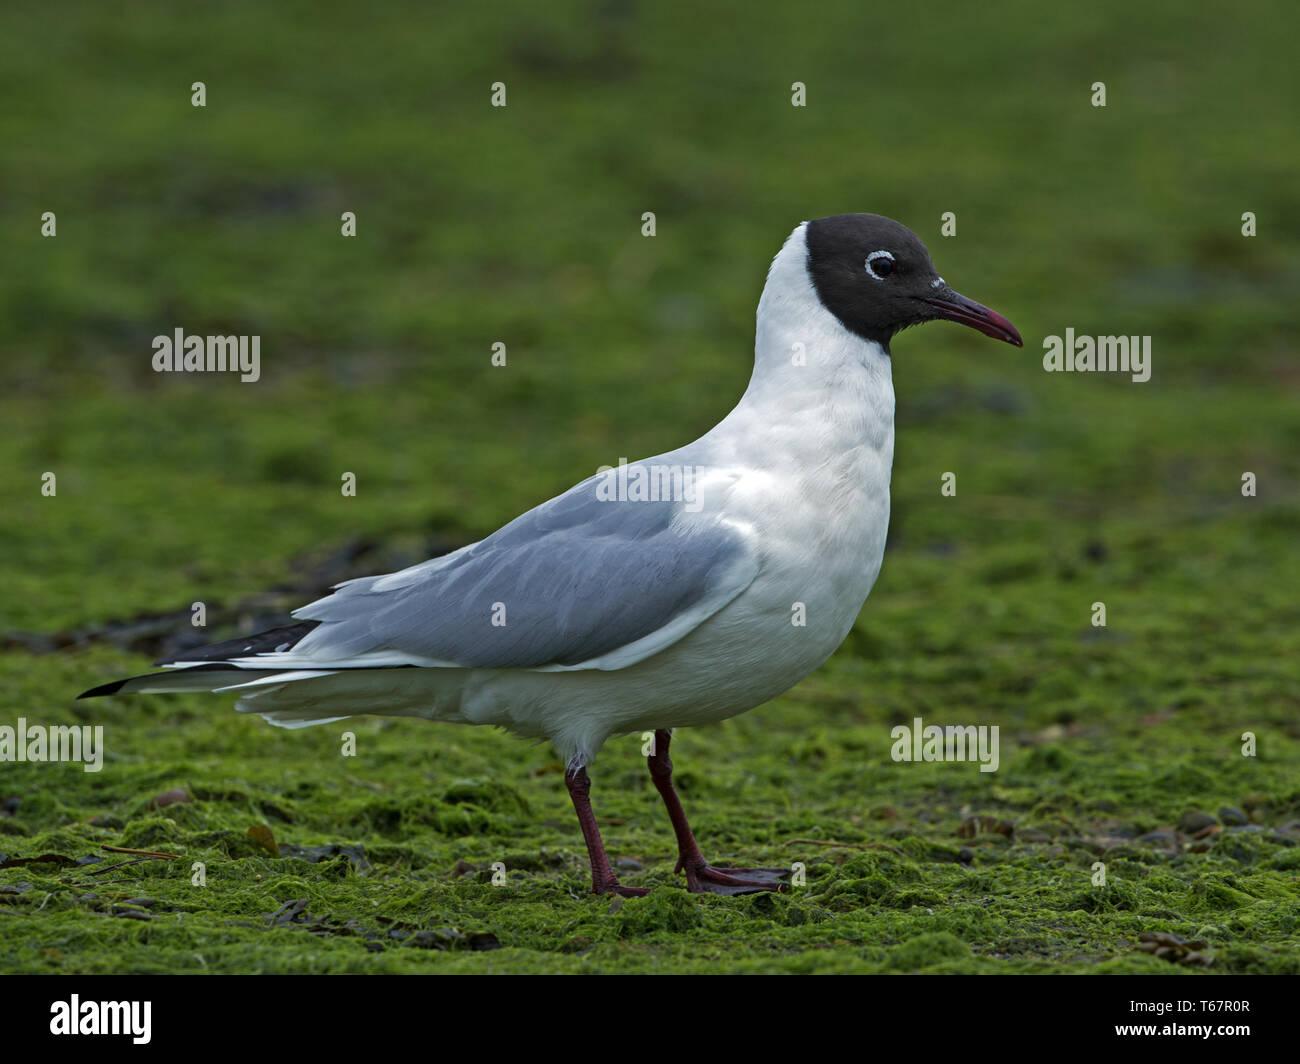 Black-headed gull in breeding plumage standing Stock Photo